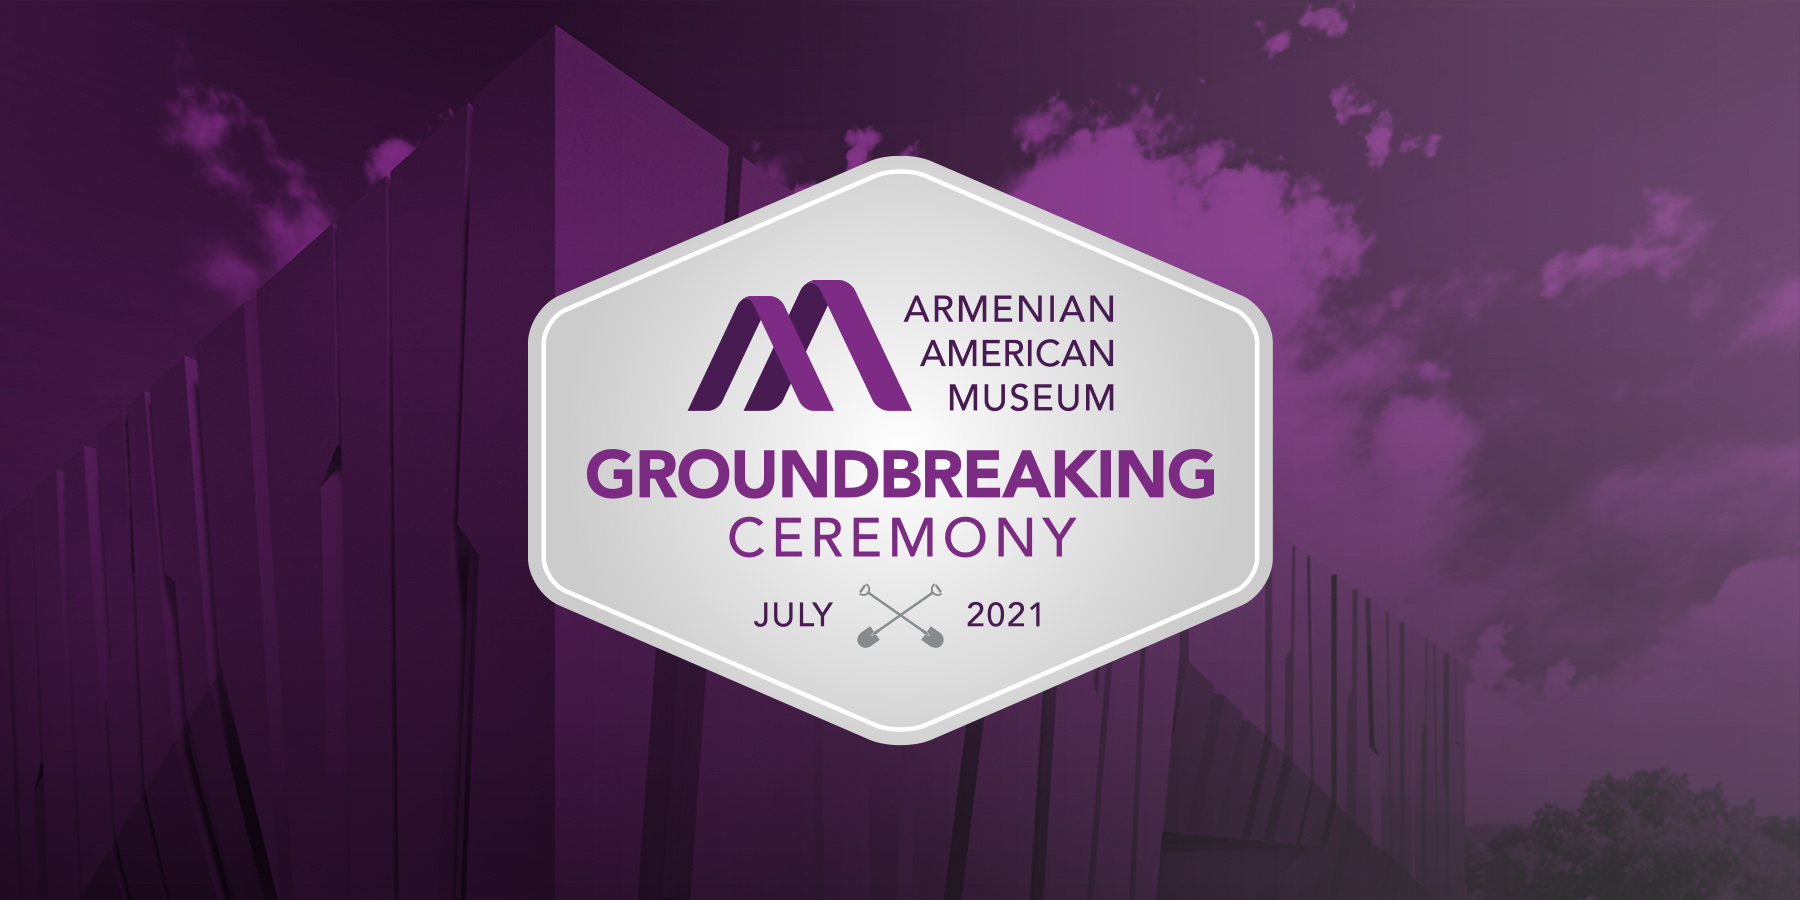 Armenian American Museum Groundbreaking Ceremony Announcement Graphic